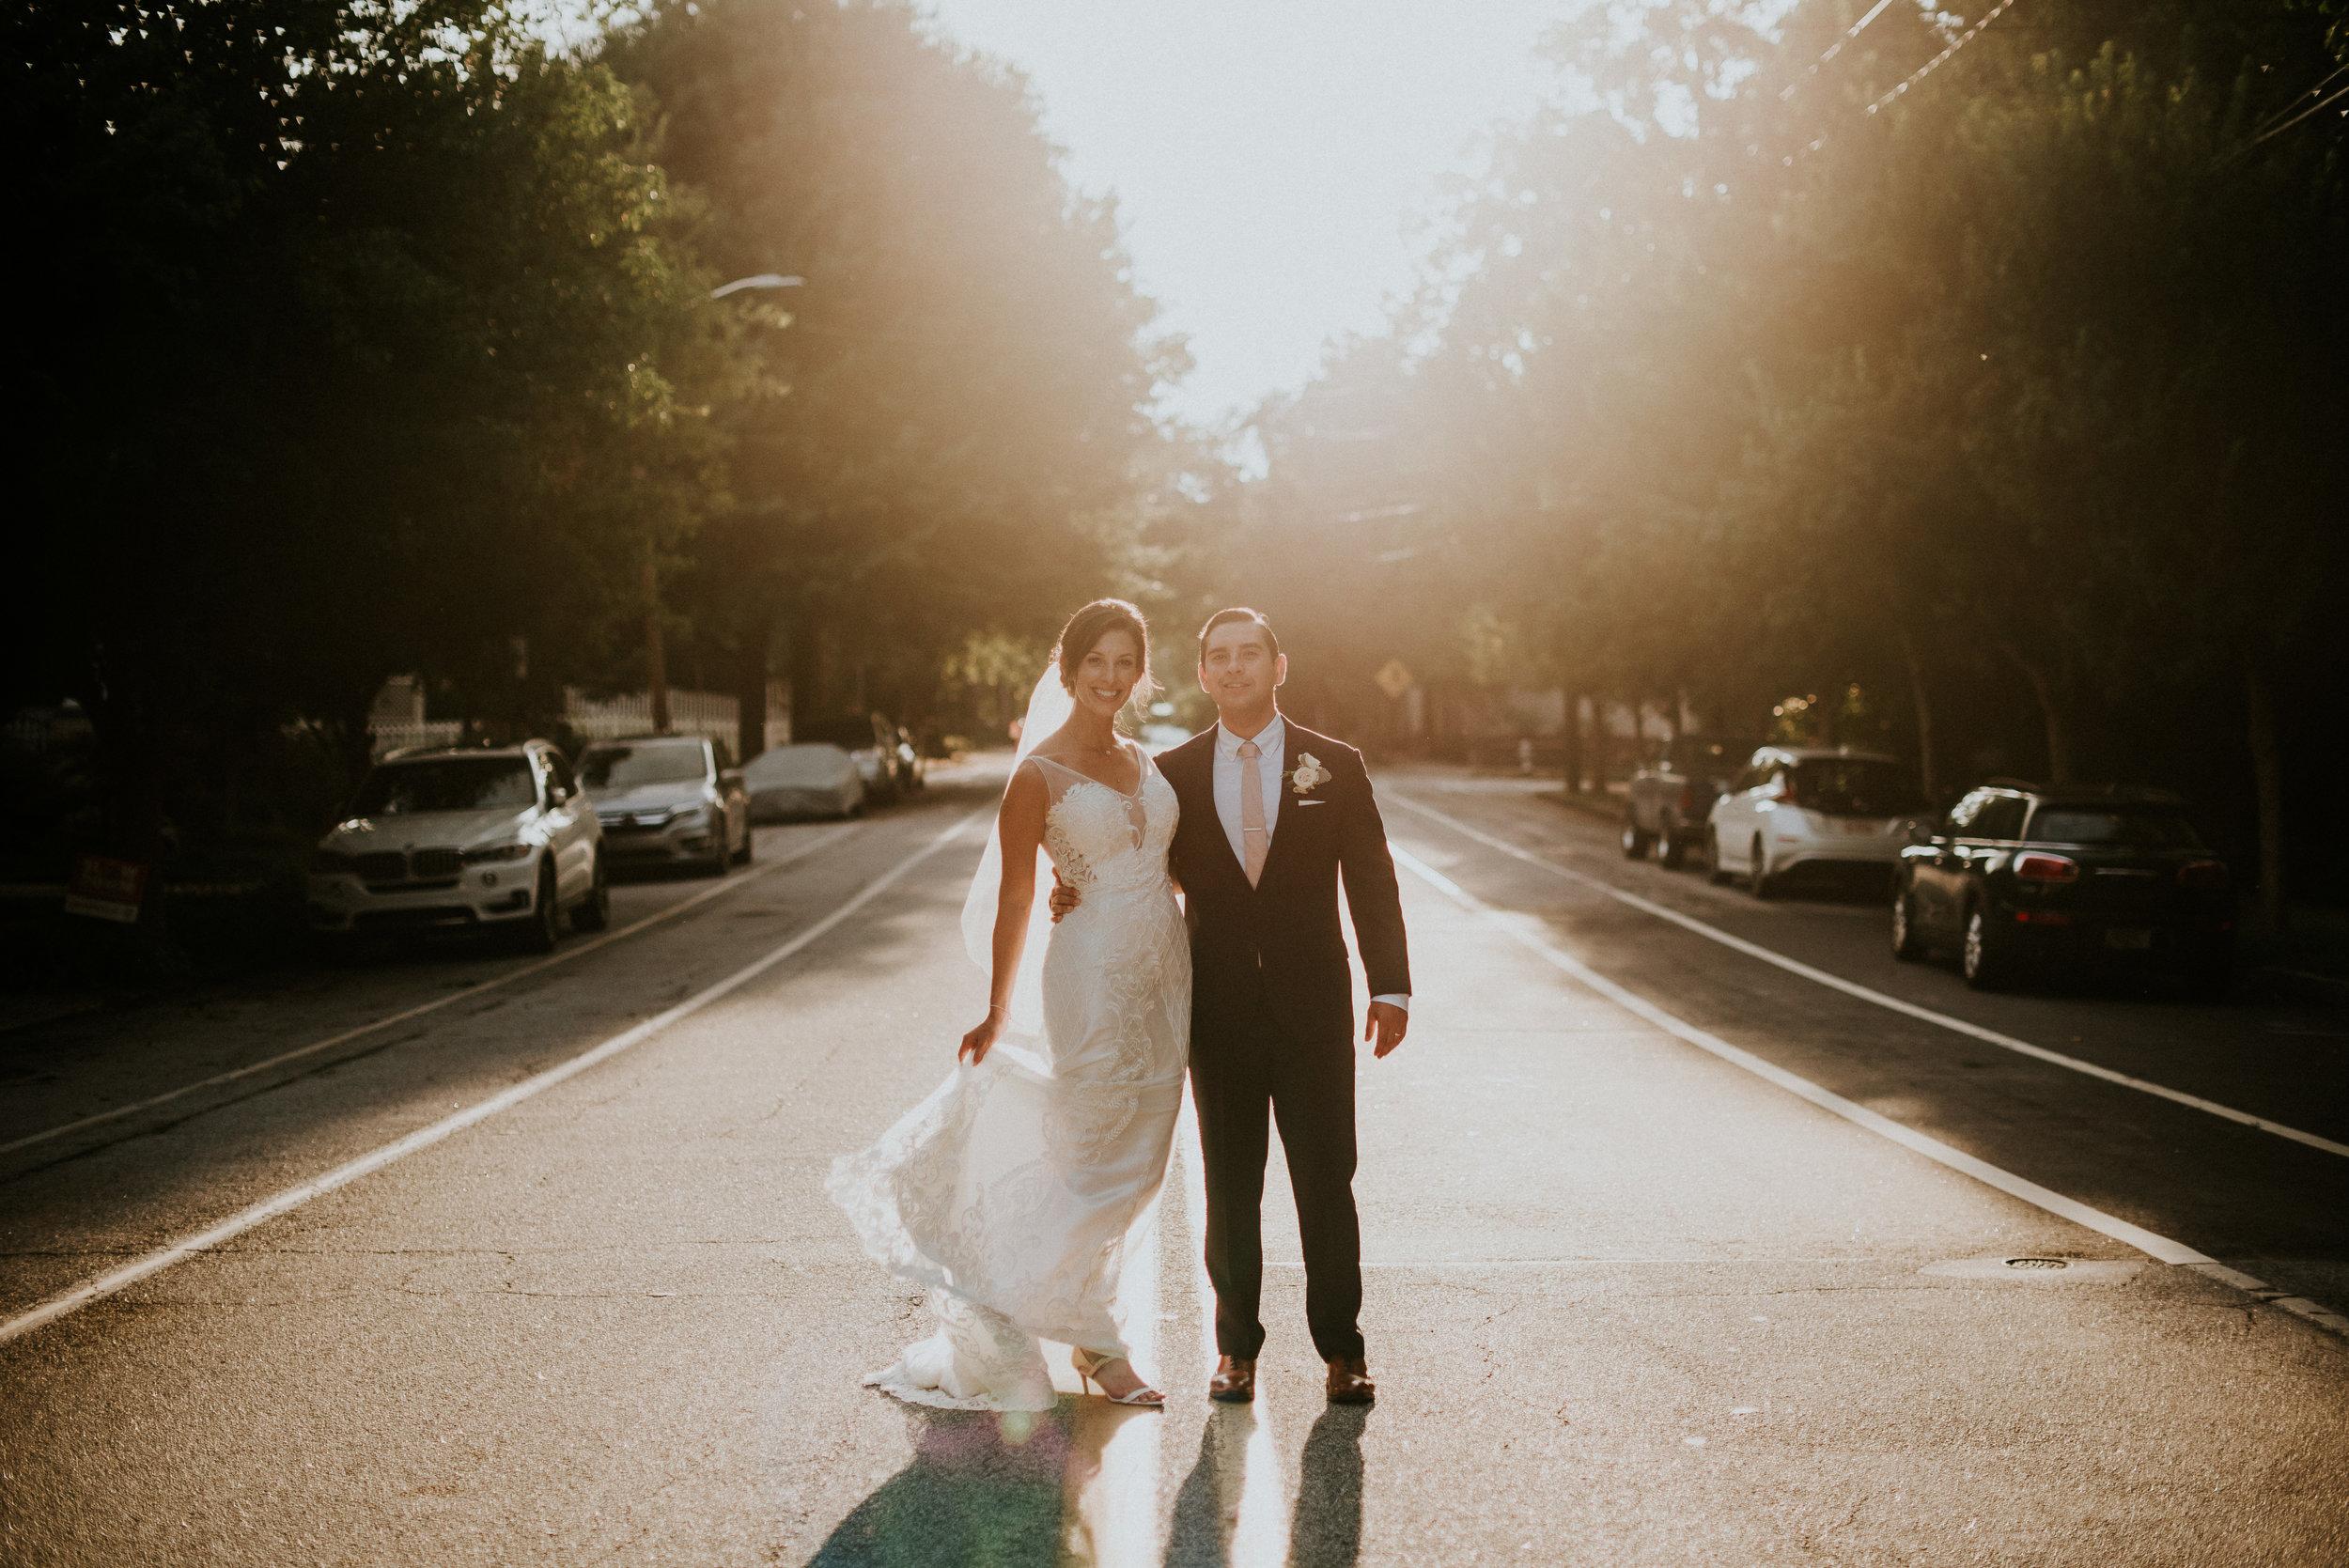 Newlywed portraits during golden hour in Atlanta, GA